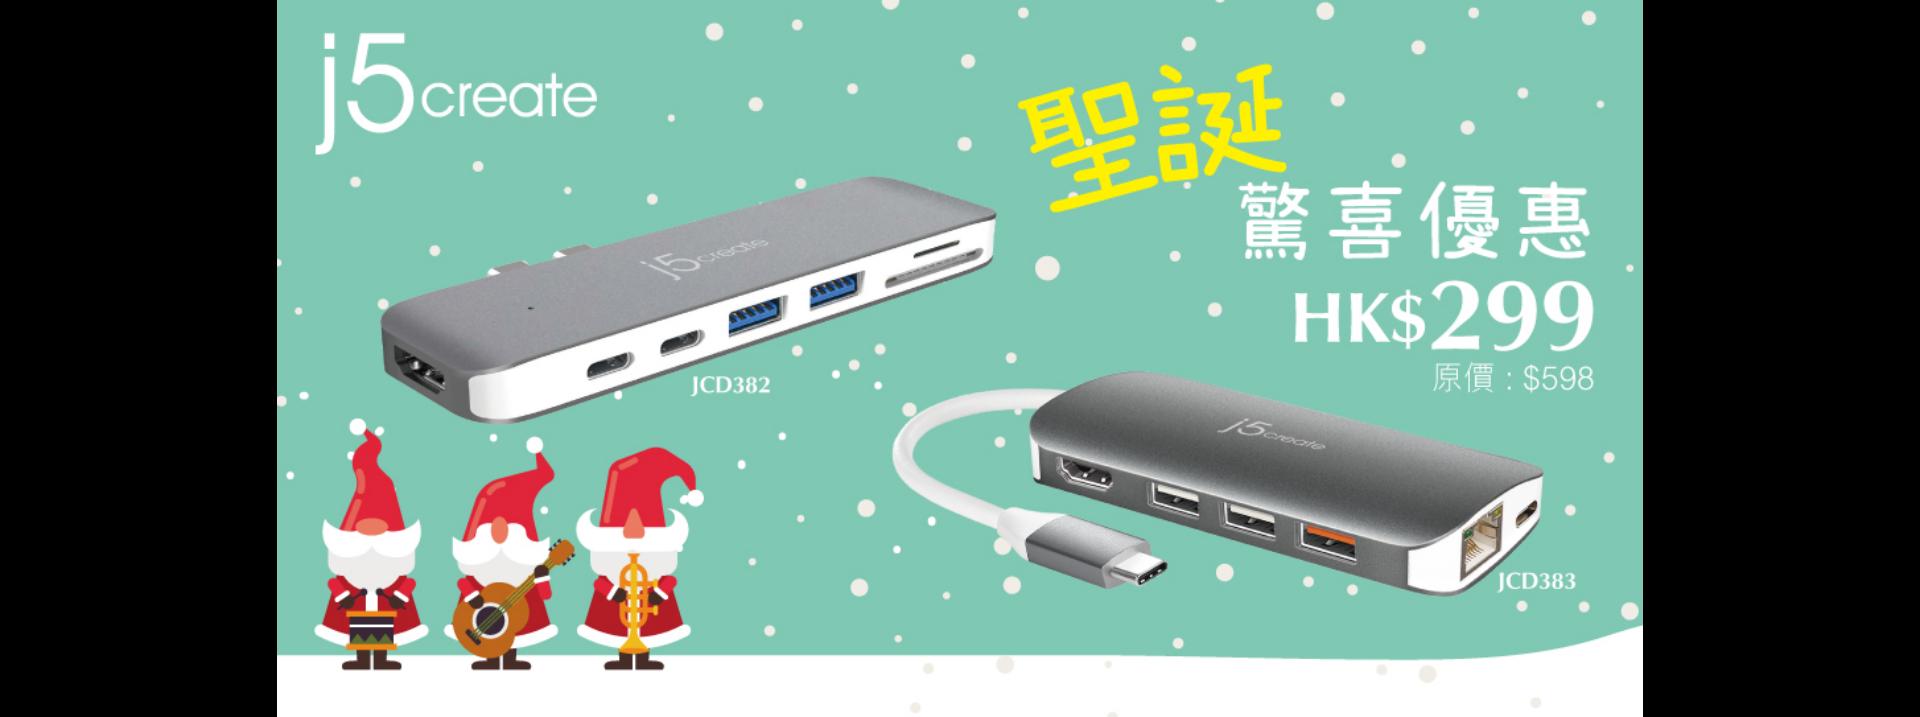 j5create 聖誕驚喜優惠 Christmas Promotion